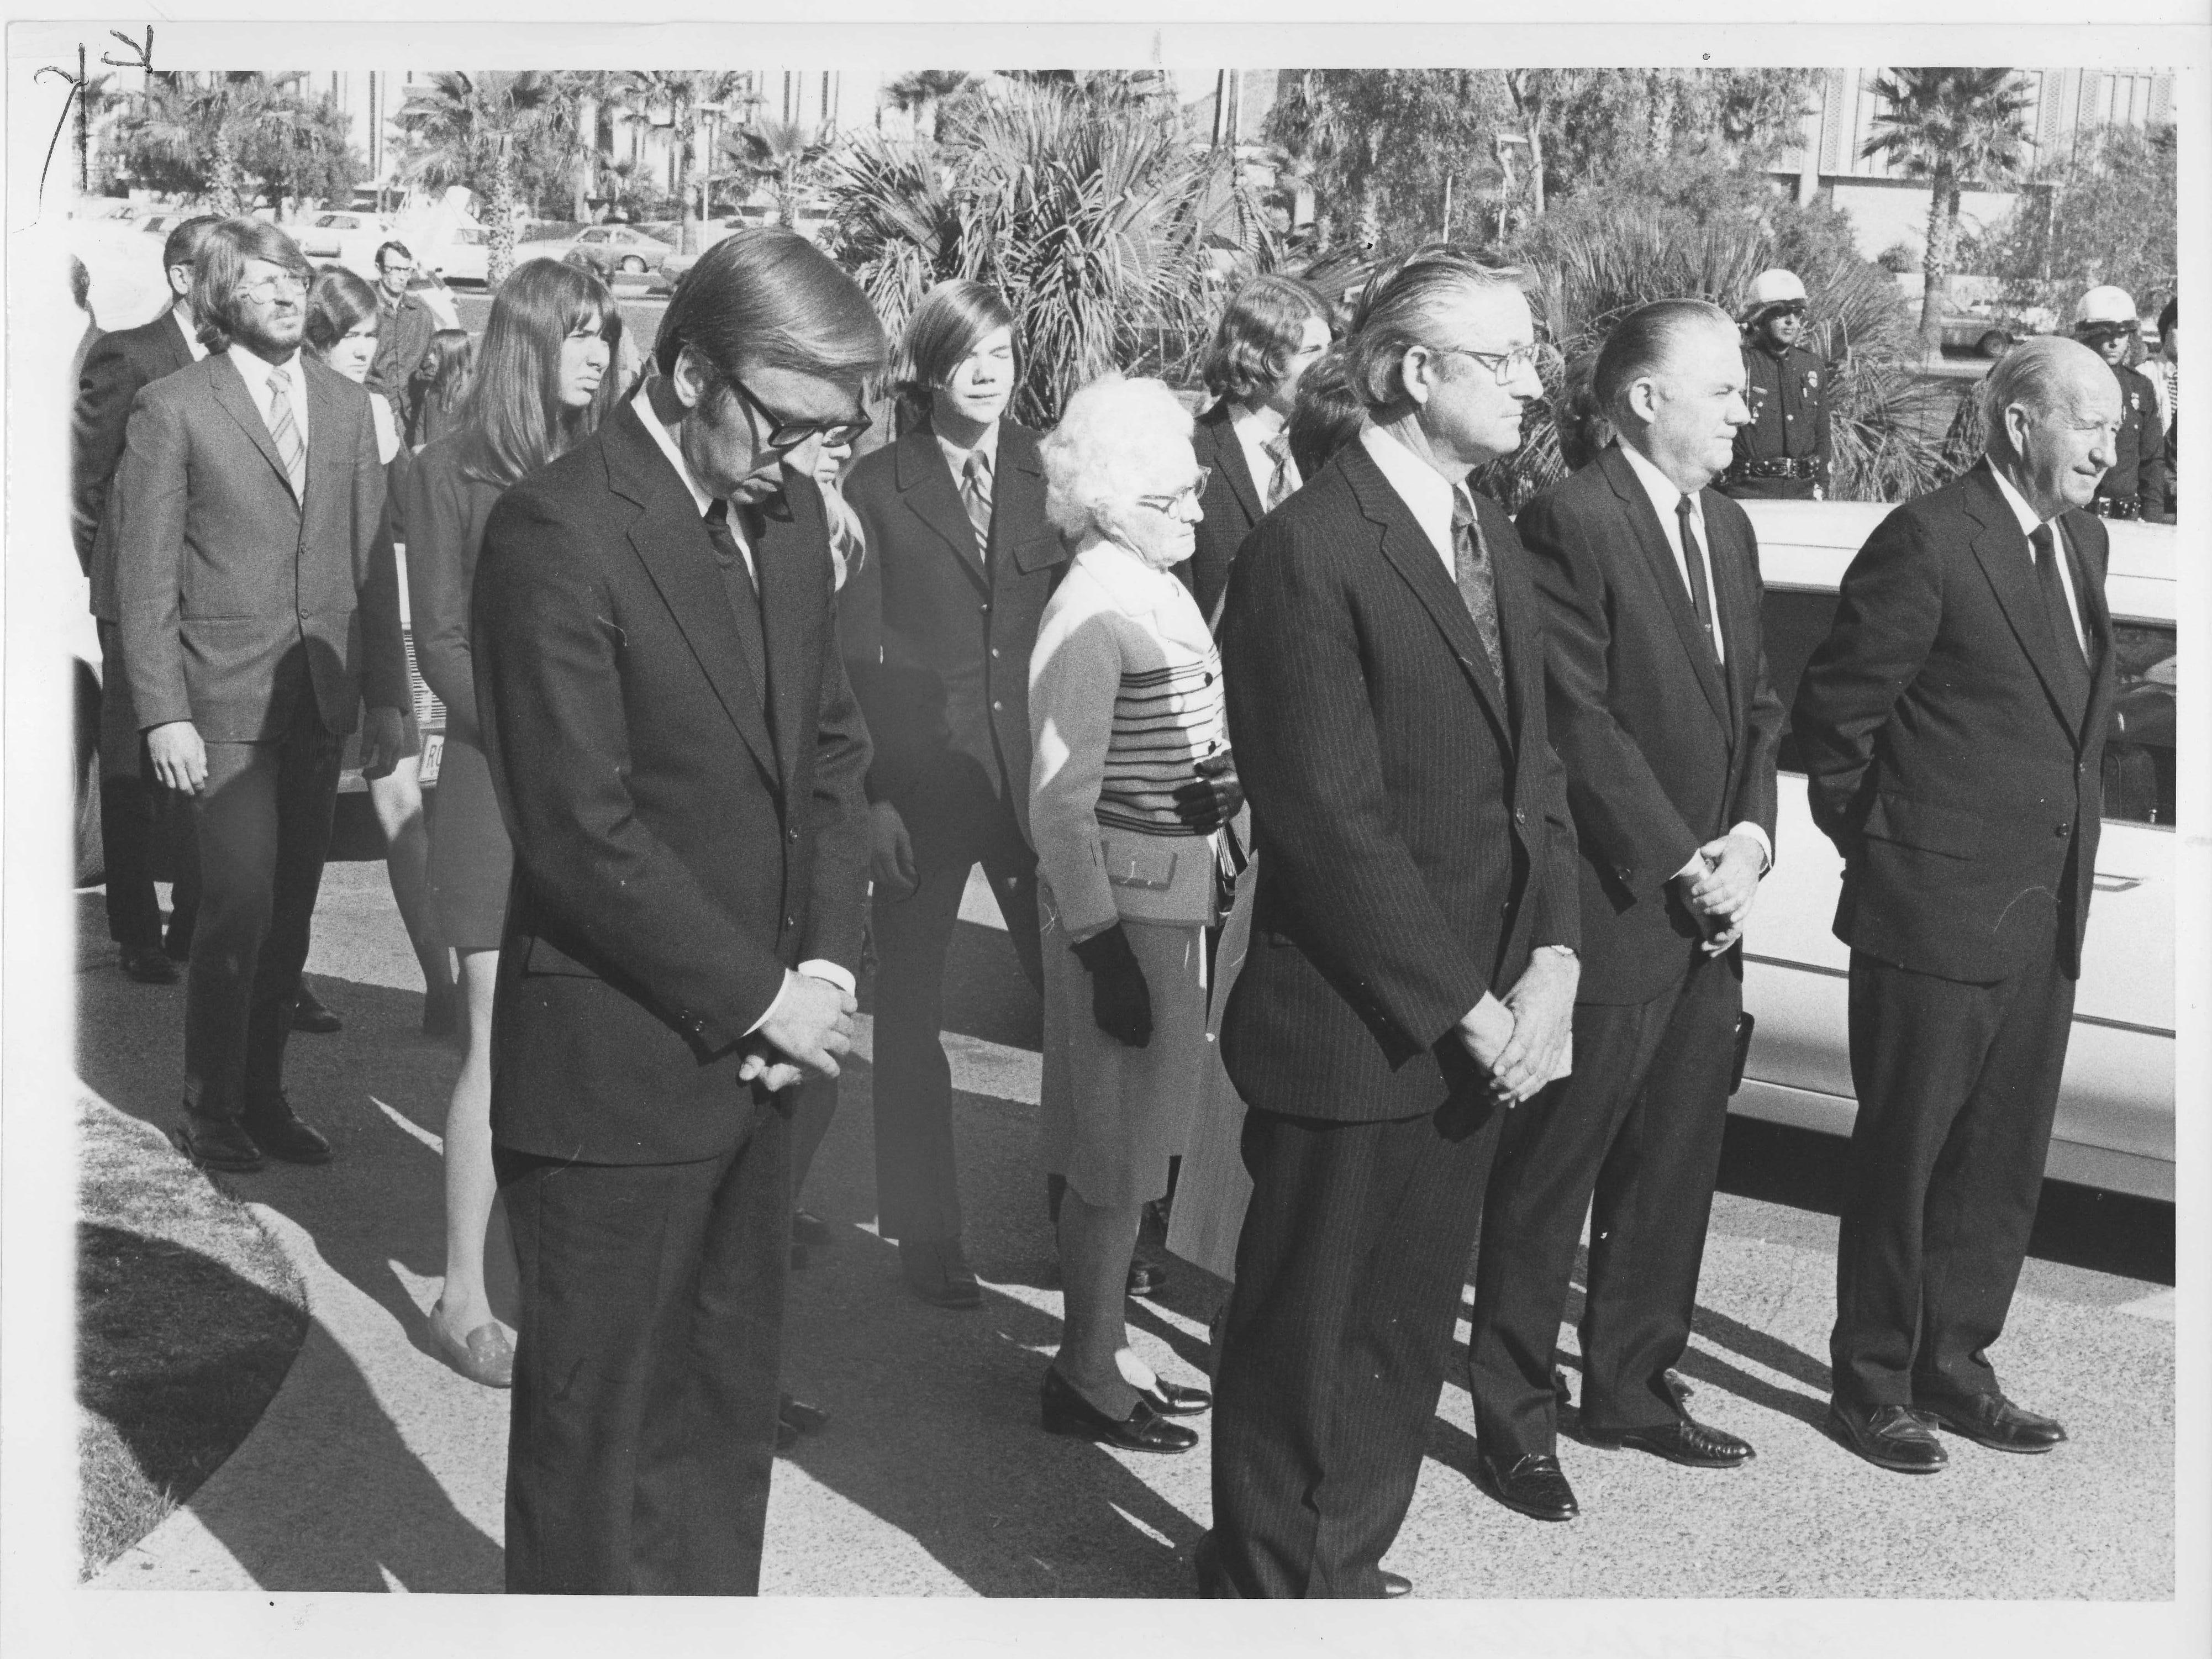 Attendees at former Sen. Carl Hayden's funeral in 1972.